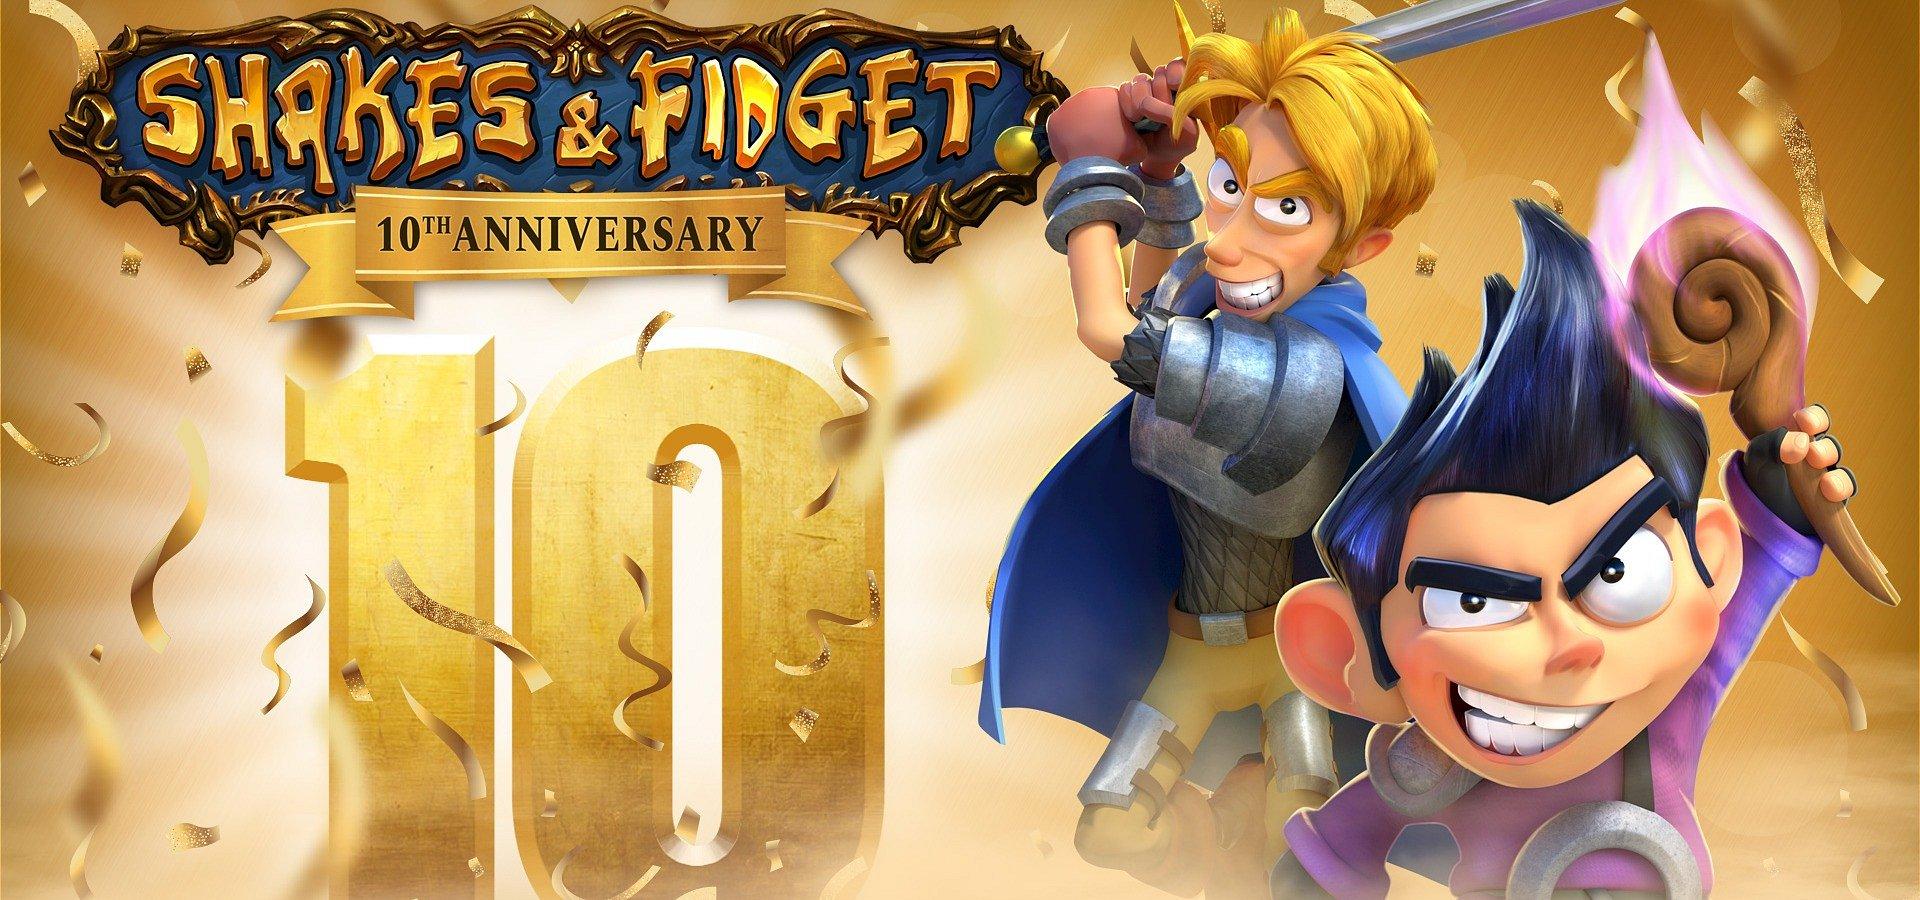 Shakes & Fidget oslavují 10th jubileum